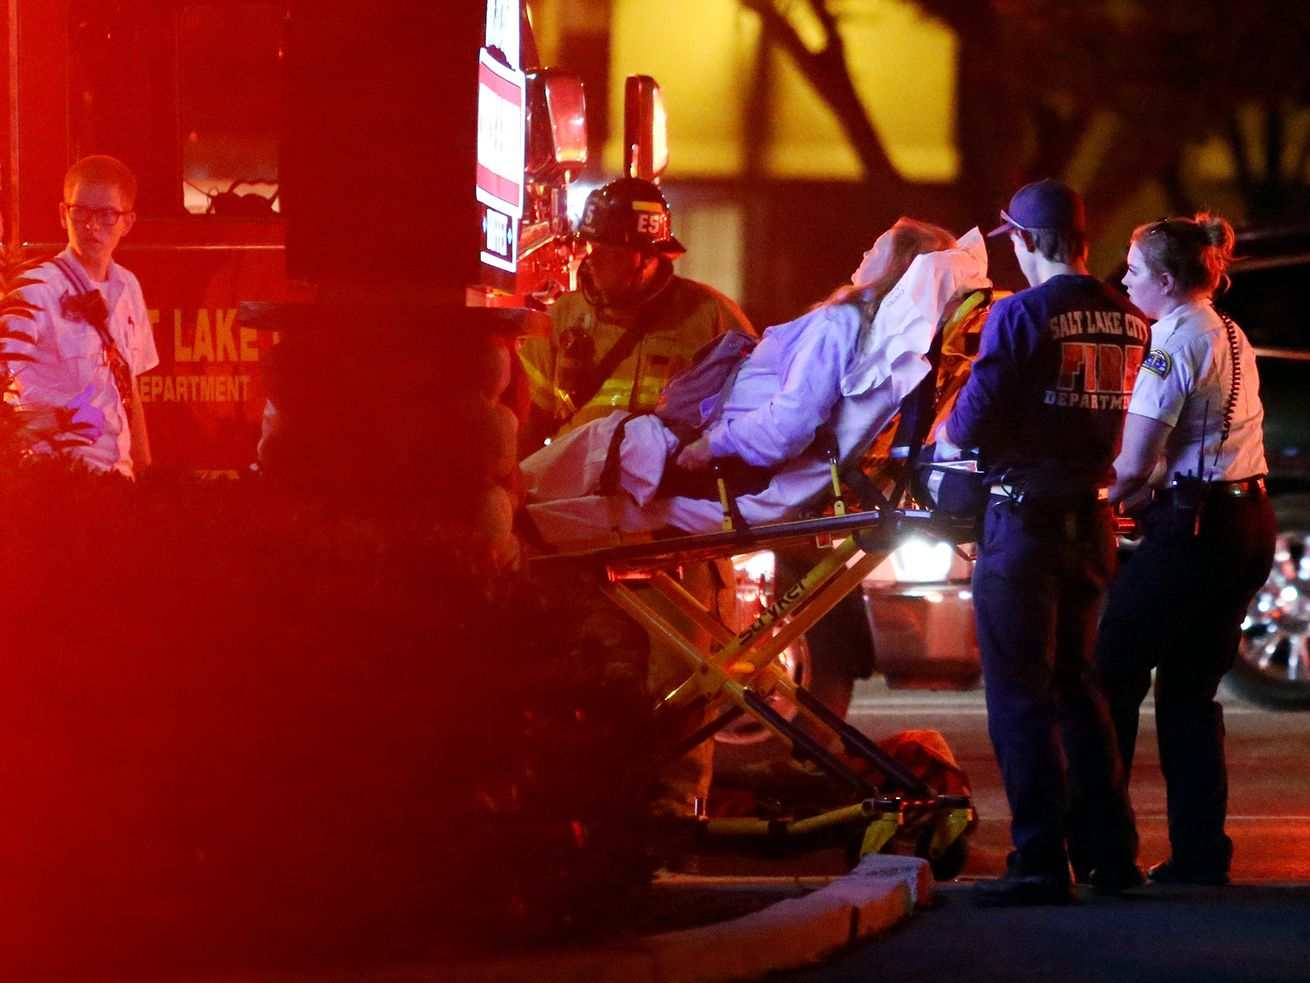 Salt Lake restaurant evacuated after patrons accidentally pepper sprayed